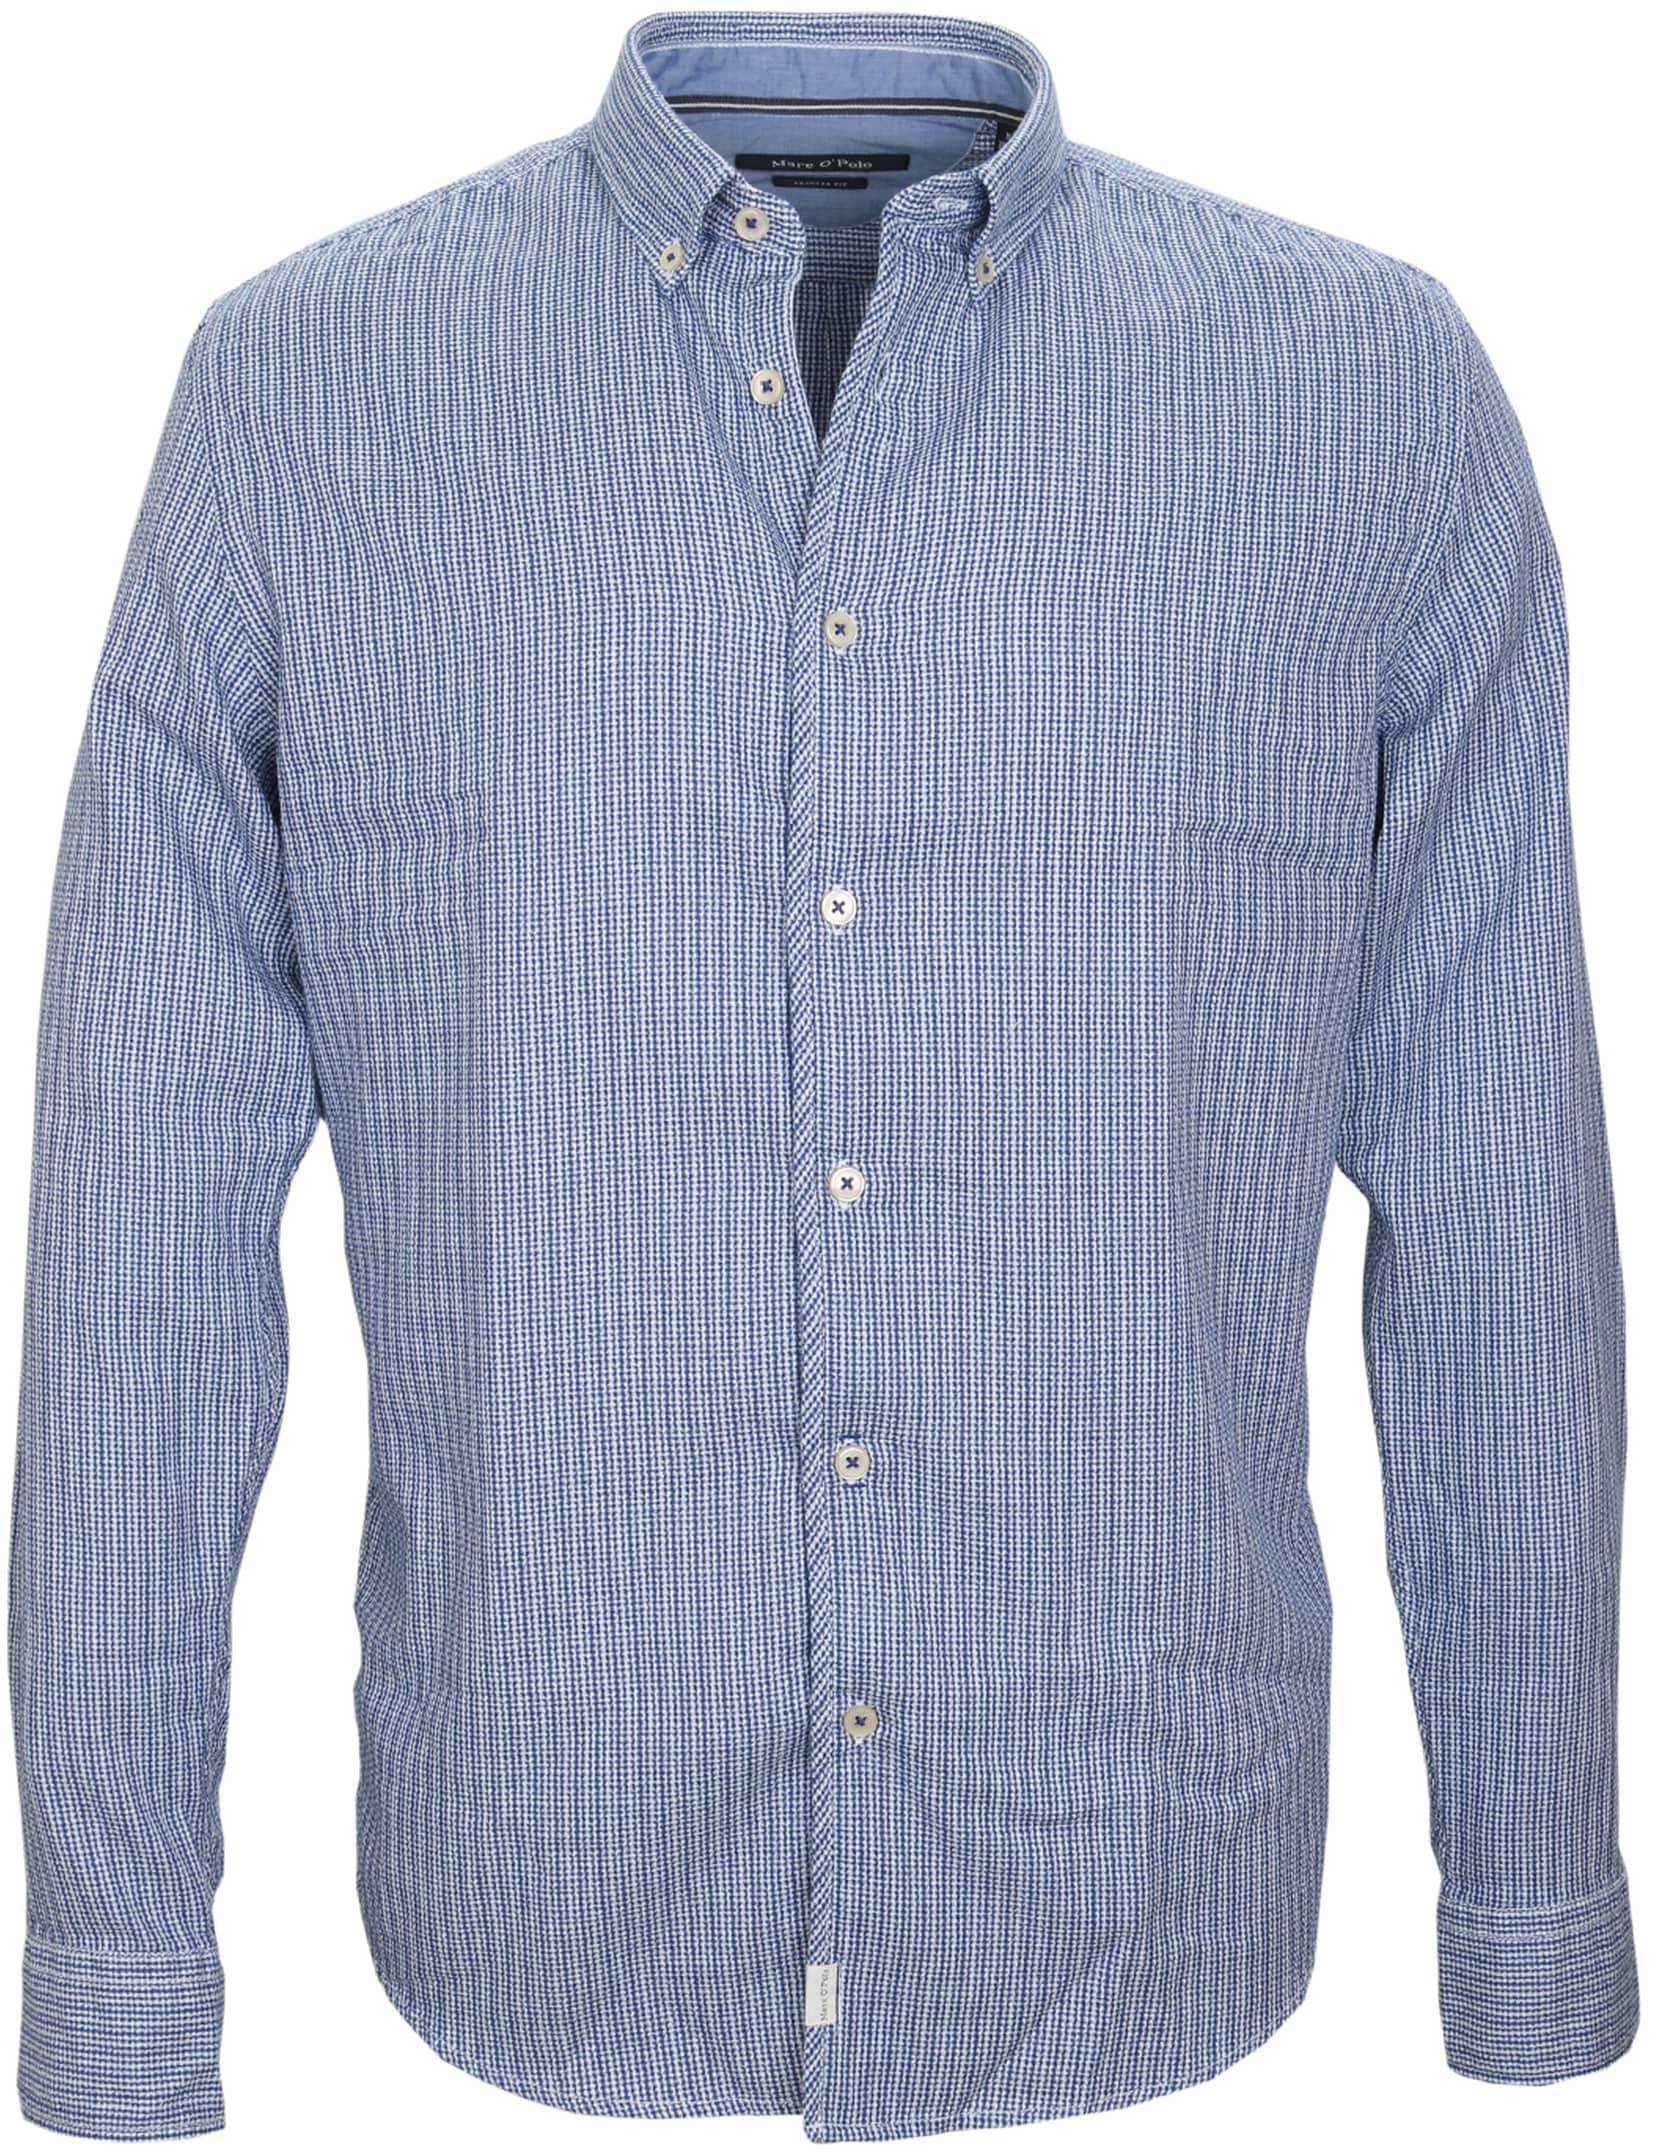 Marc O'Polo Overhemd Dessin Navy foto 0